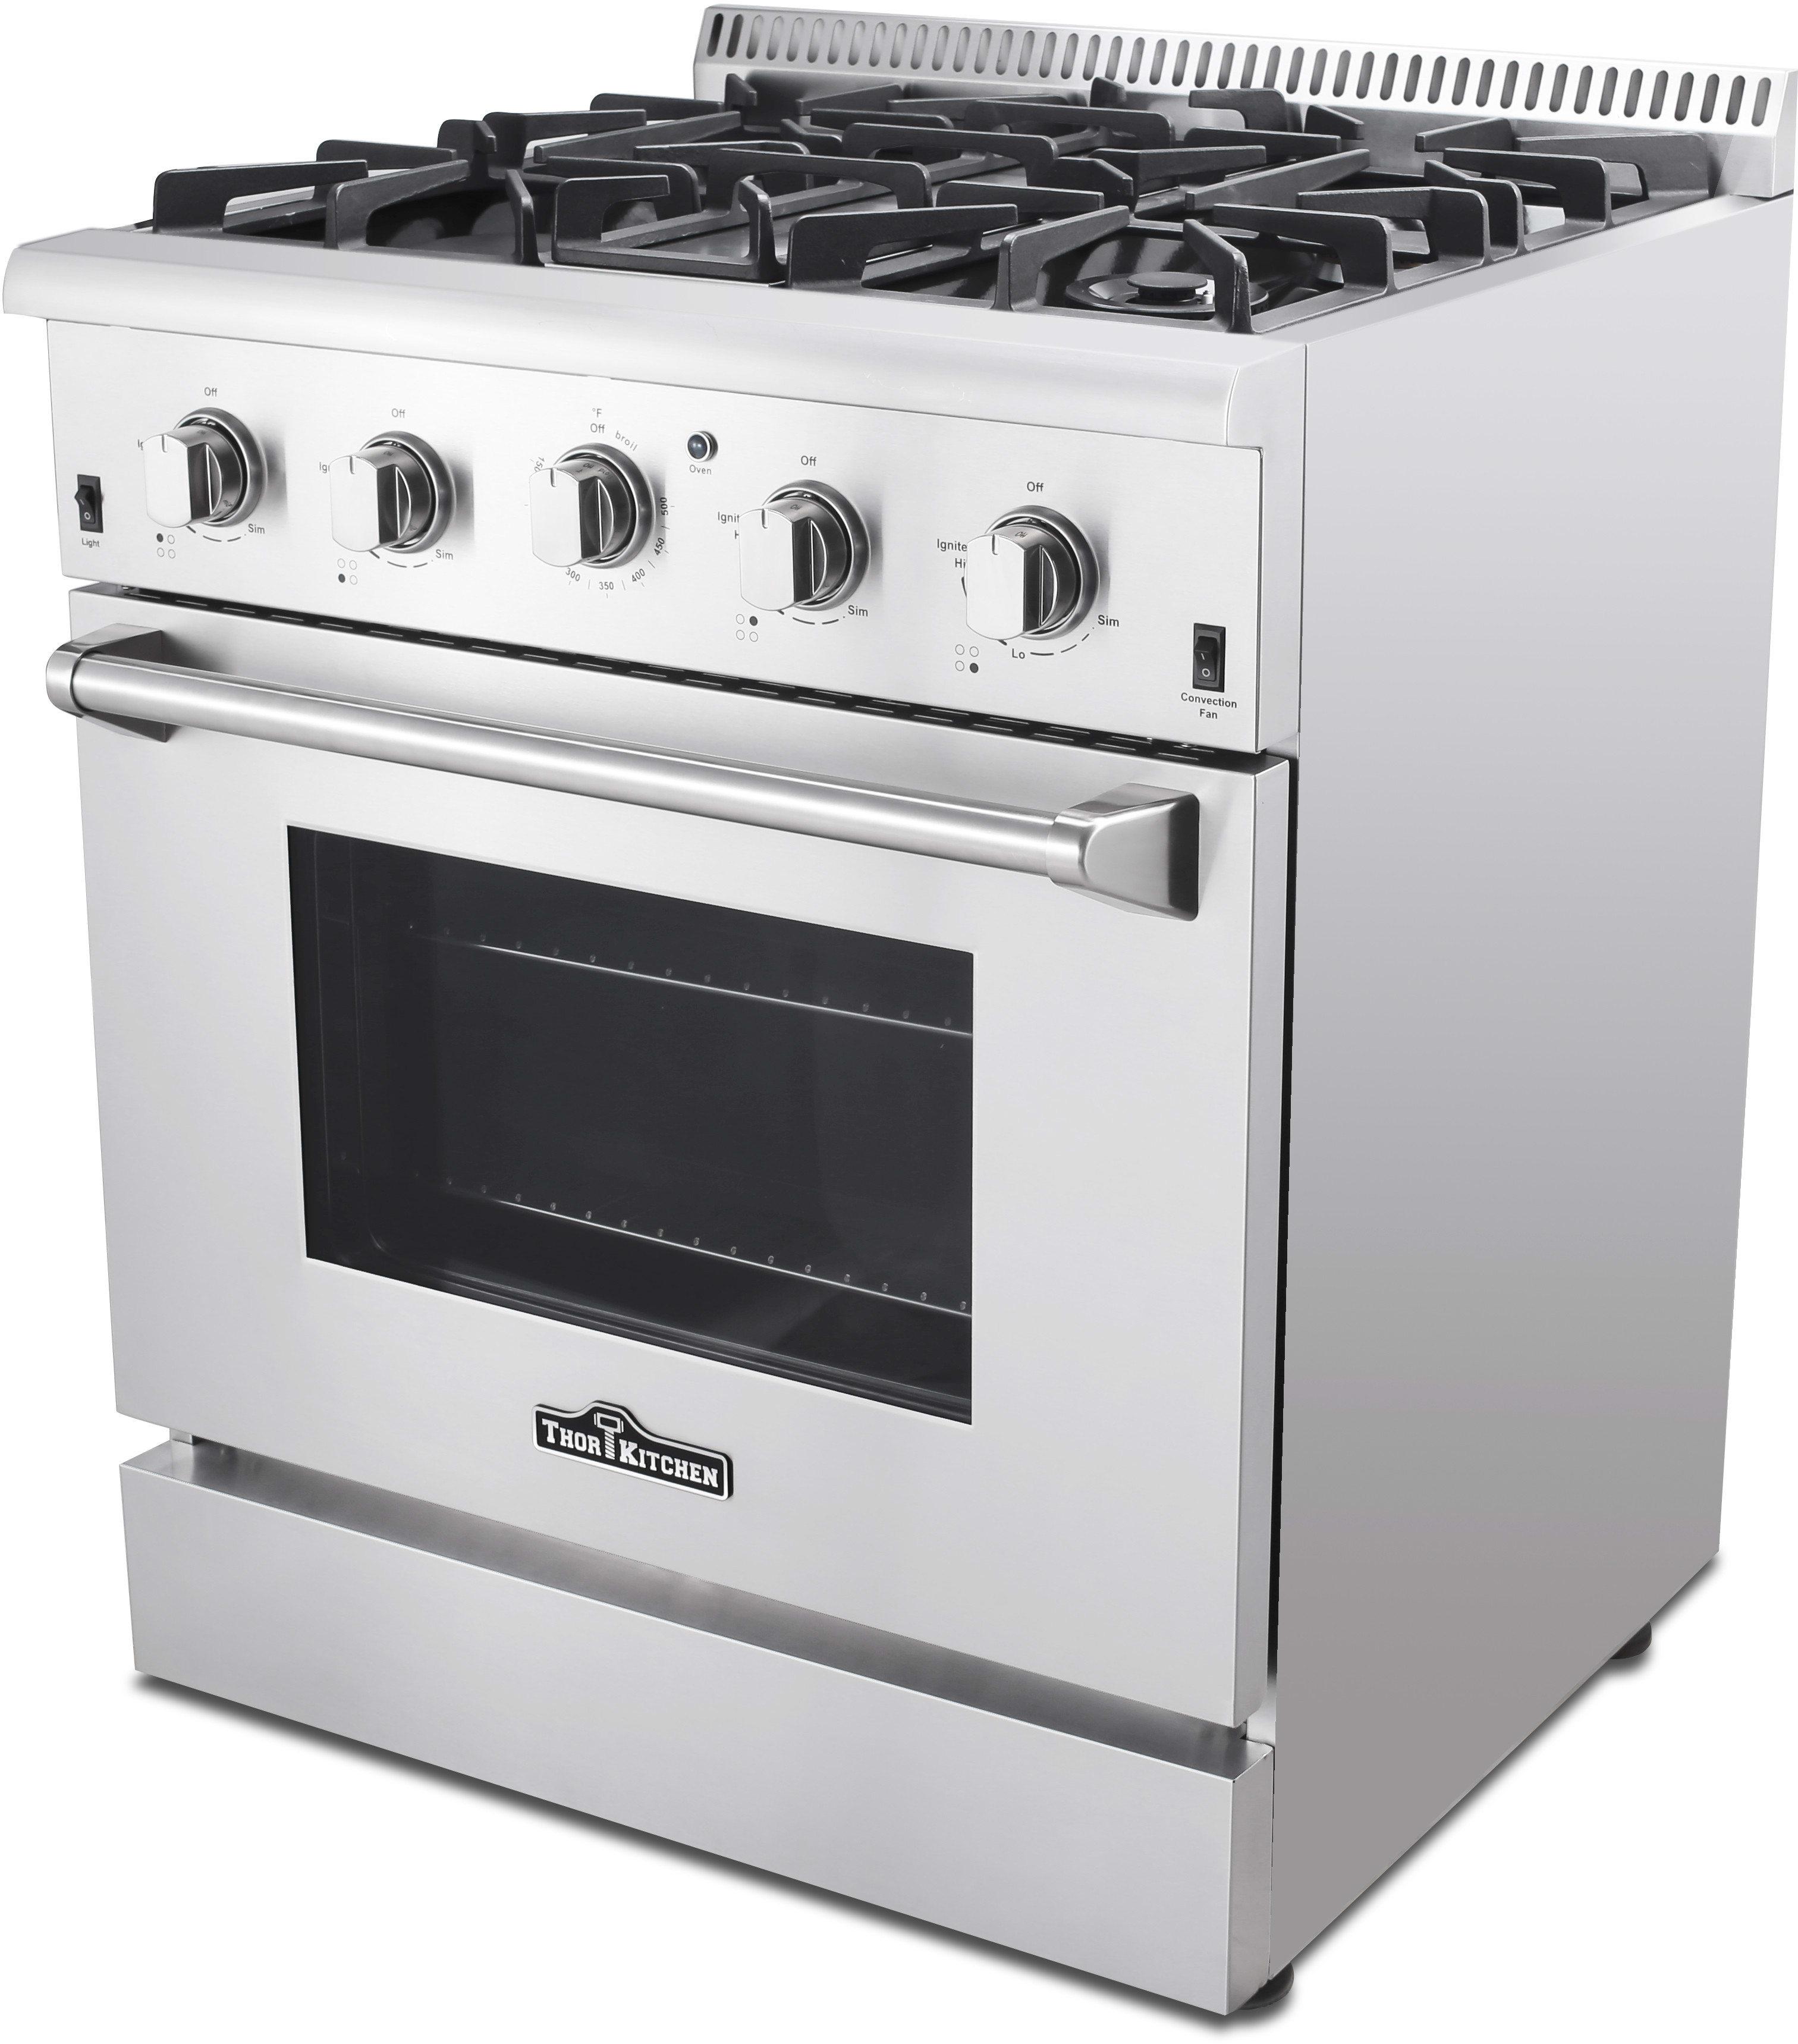 Thor Kitchen HRG3080U 30 Inch Freestanding Gas Range with Convection ...